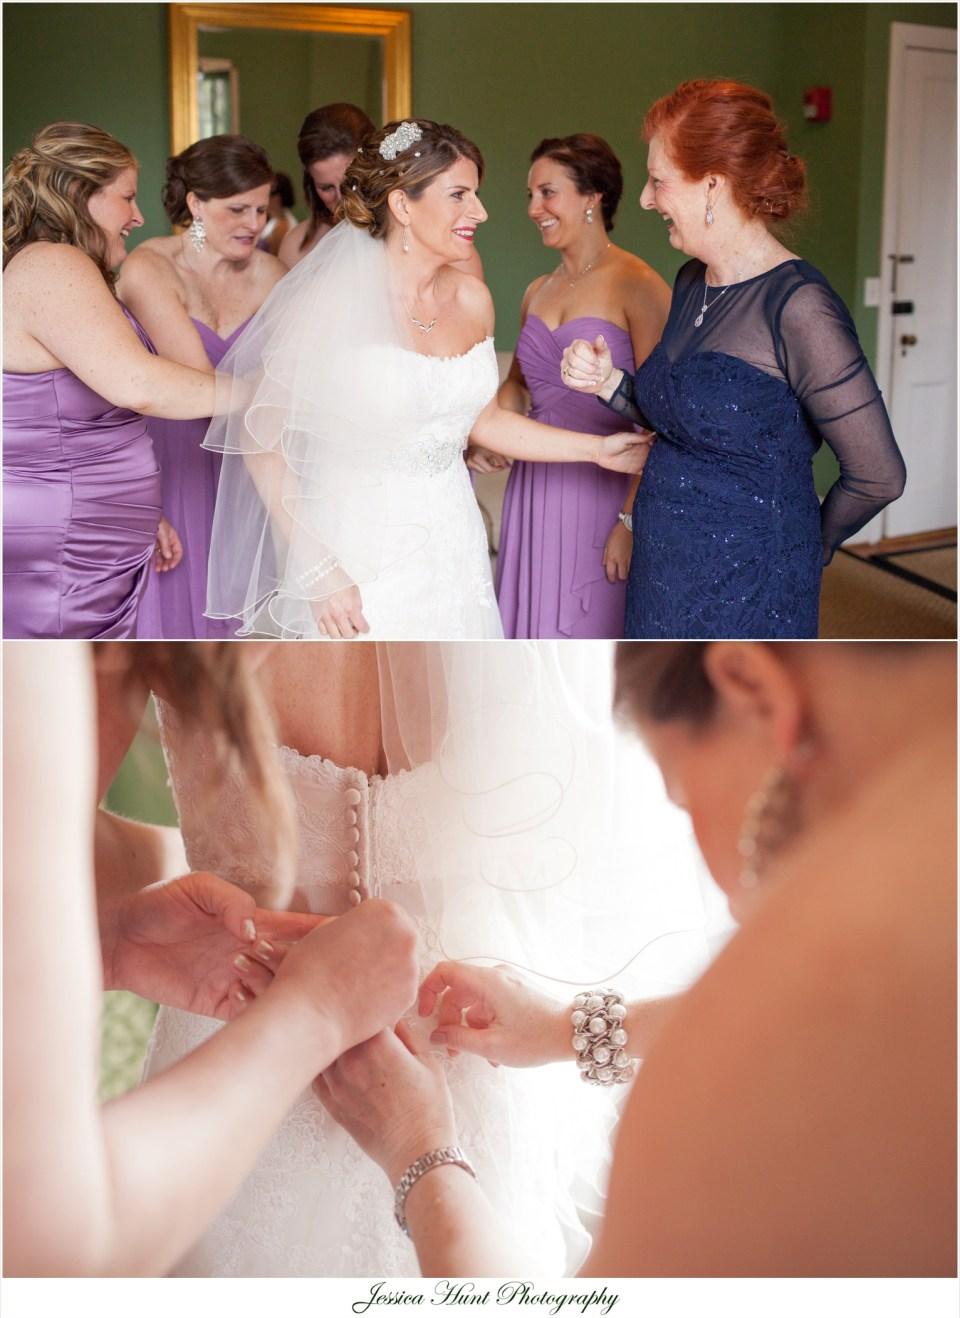 MillstoneatAdamsPond|JessicaHuntPhotography|SCWeddingPhotography|WeddingDay|2105|BLOG-19